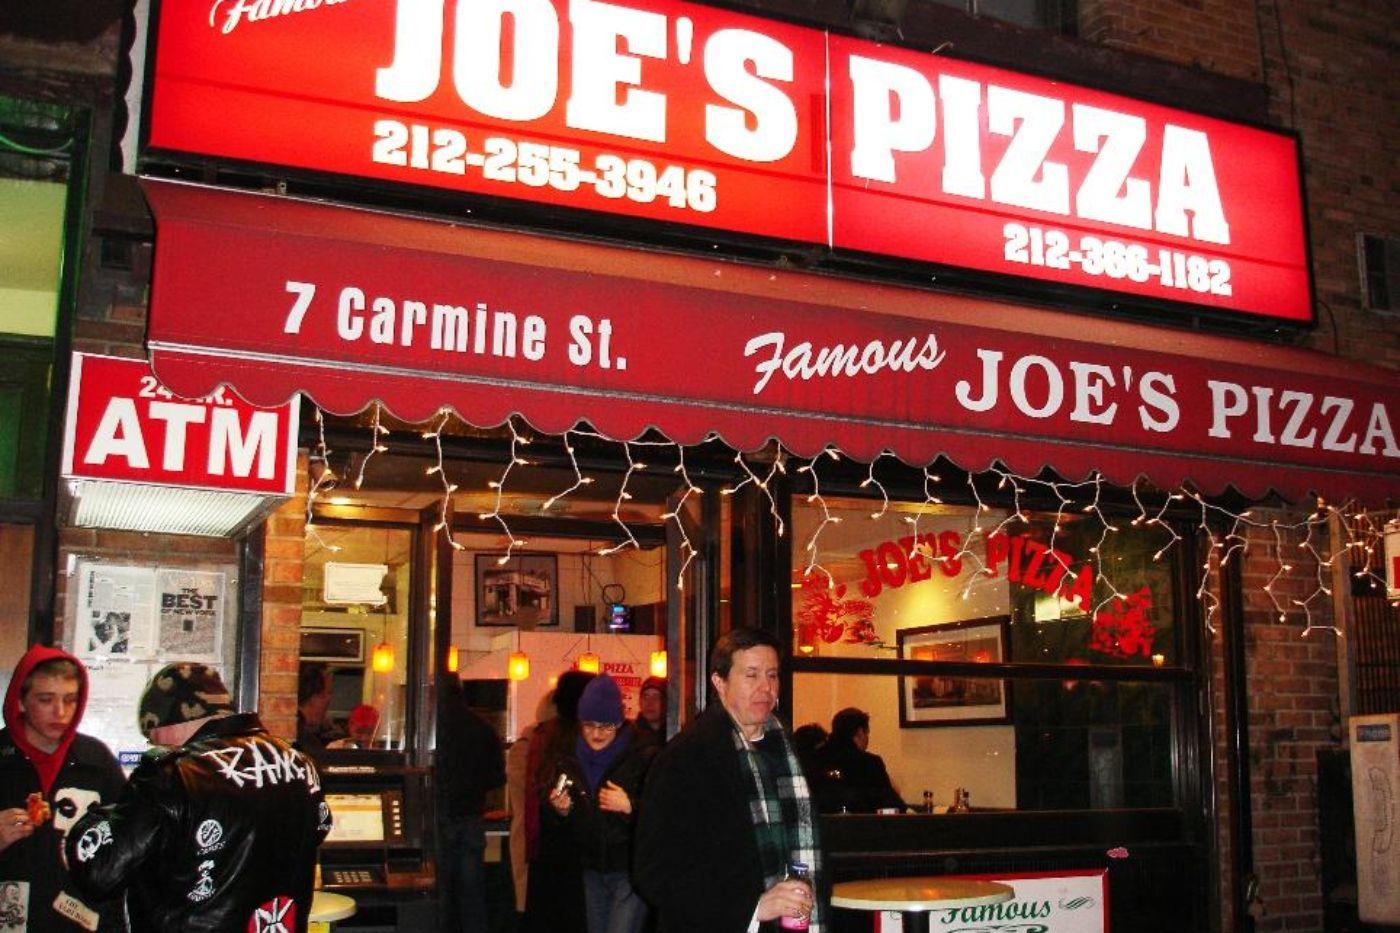 Joe S Pizza Roadfood Joe S Pizza Pizza Joes